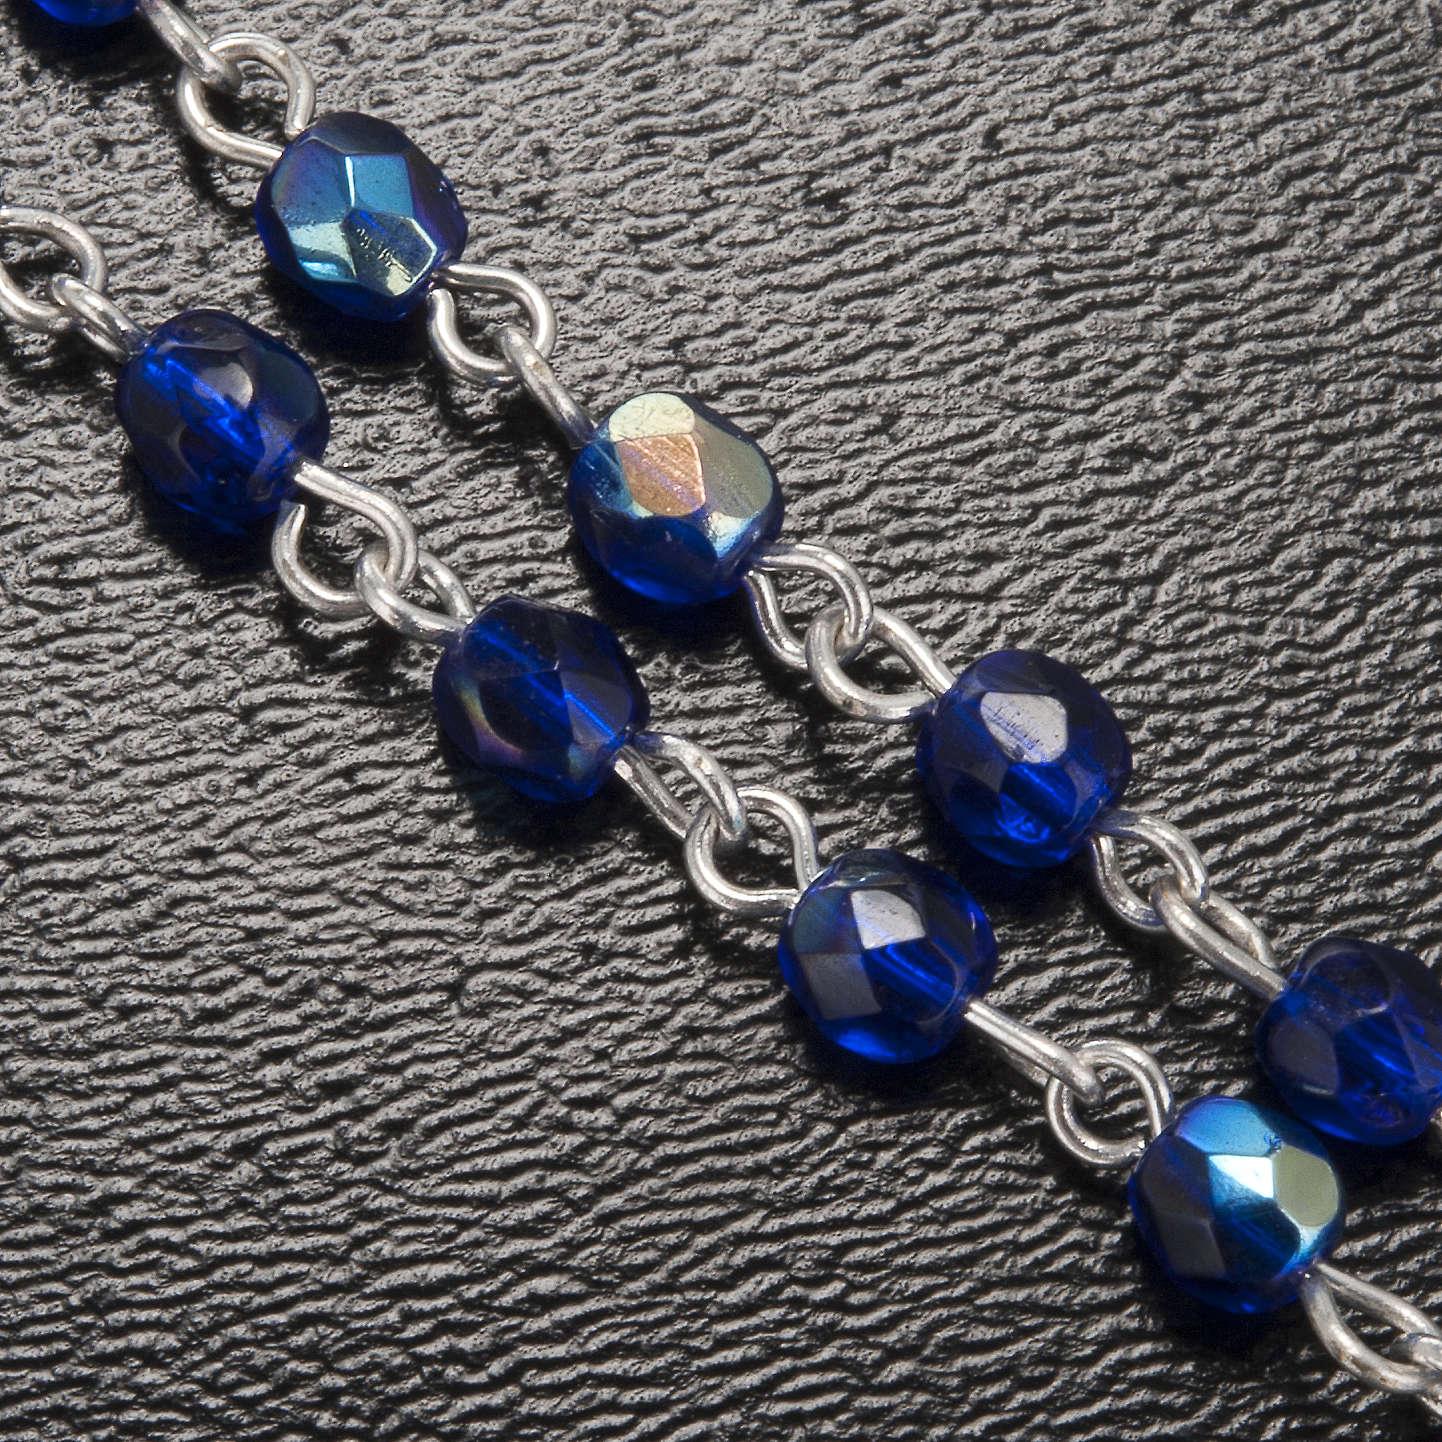 Chapelet Ghirelli Lourdes bleu 3 mm 4